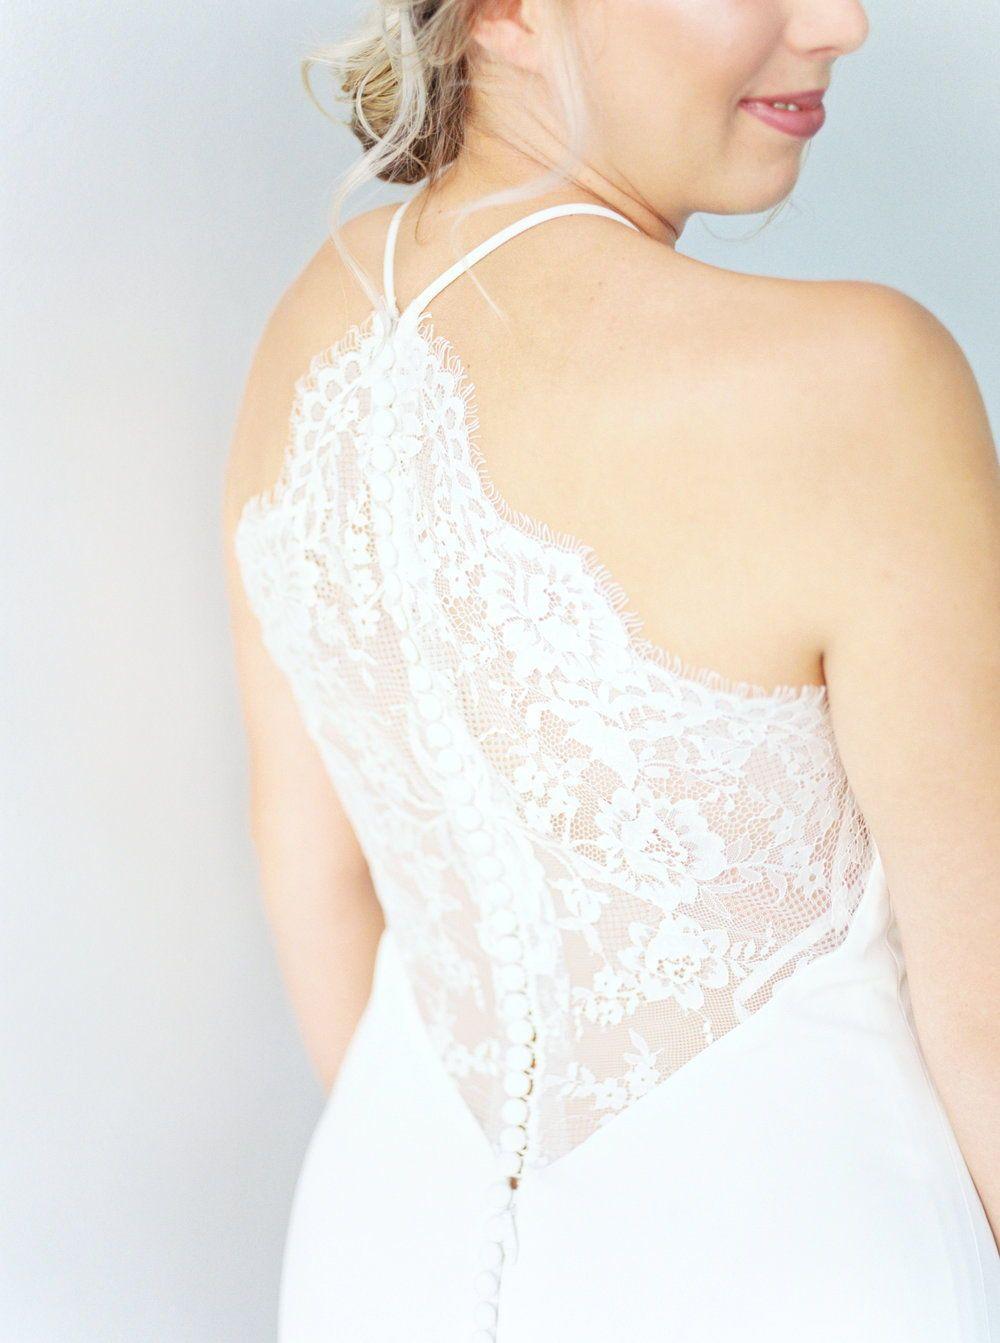 Liberty And Lace Philadelphia Wedding Dress Boutique Wedding Dresses Designer Wedding Gowns Unique Wedding Gowns